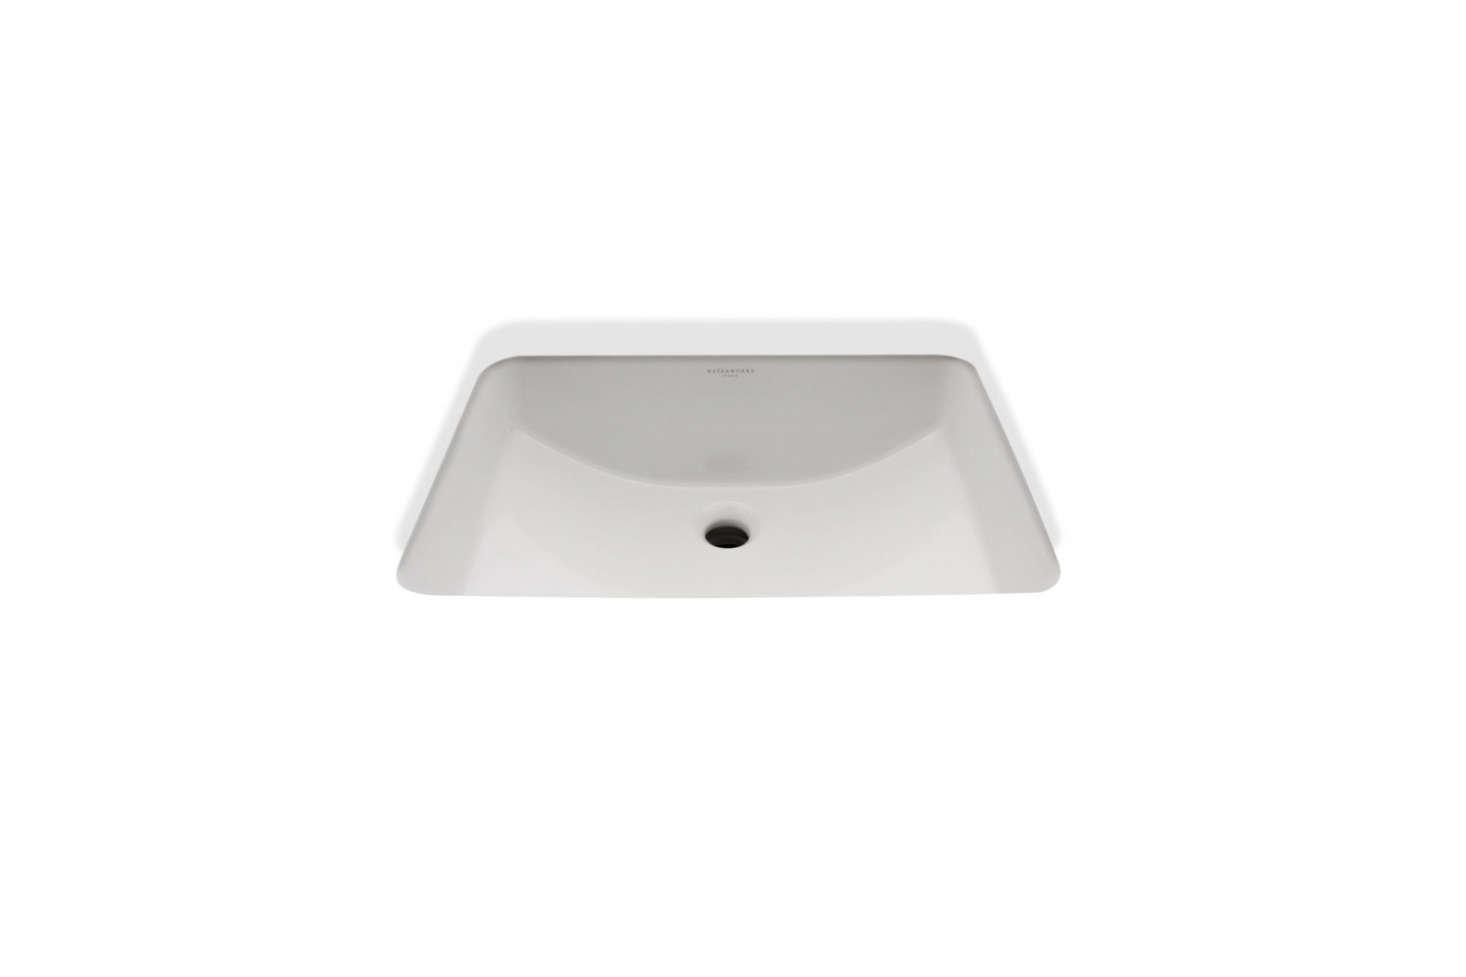 The Clara Undermount Rectangular Vitreous China Lavatory Sink is $304 at Waterworks.